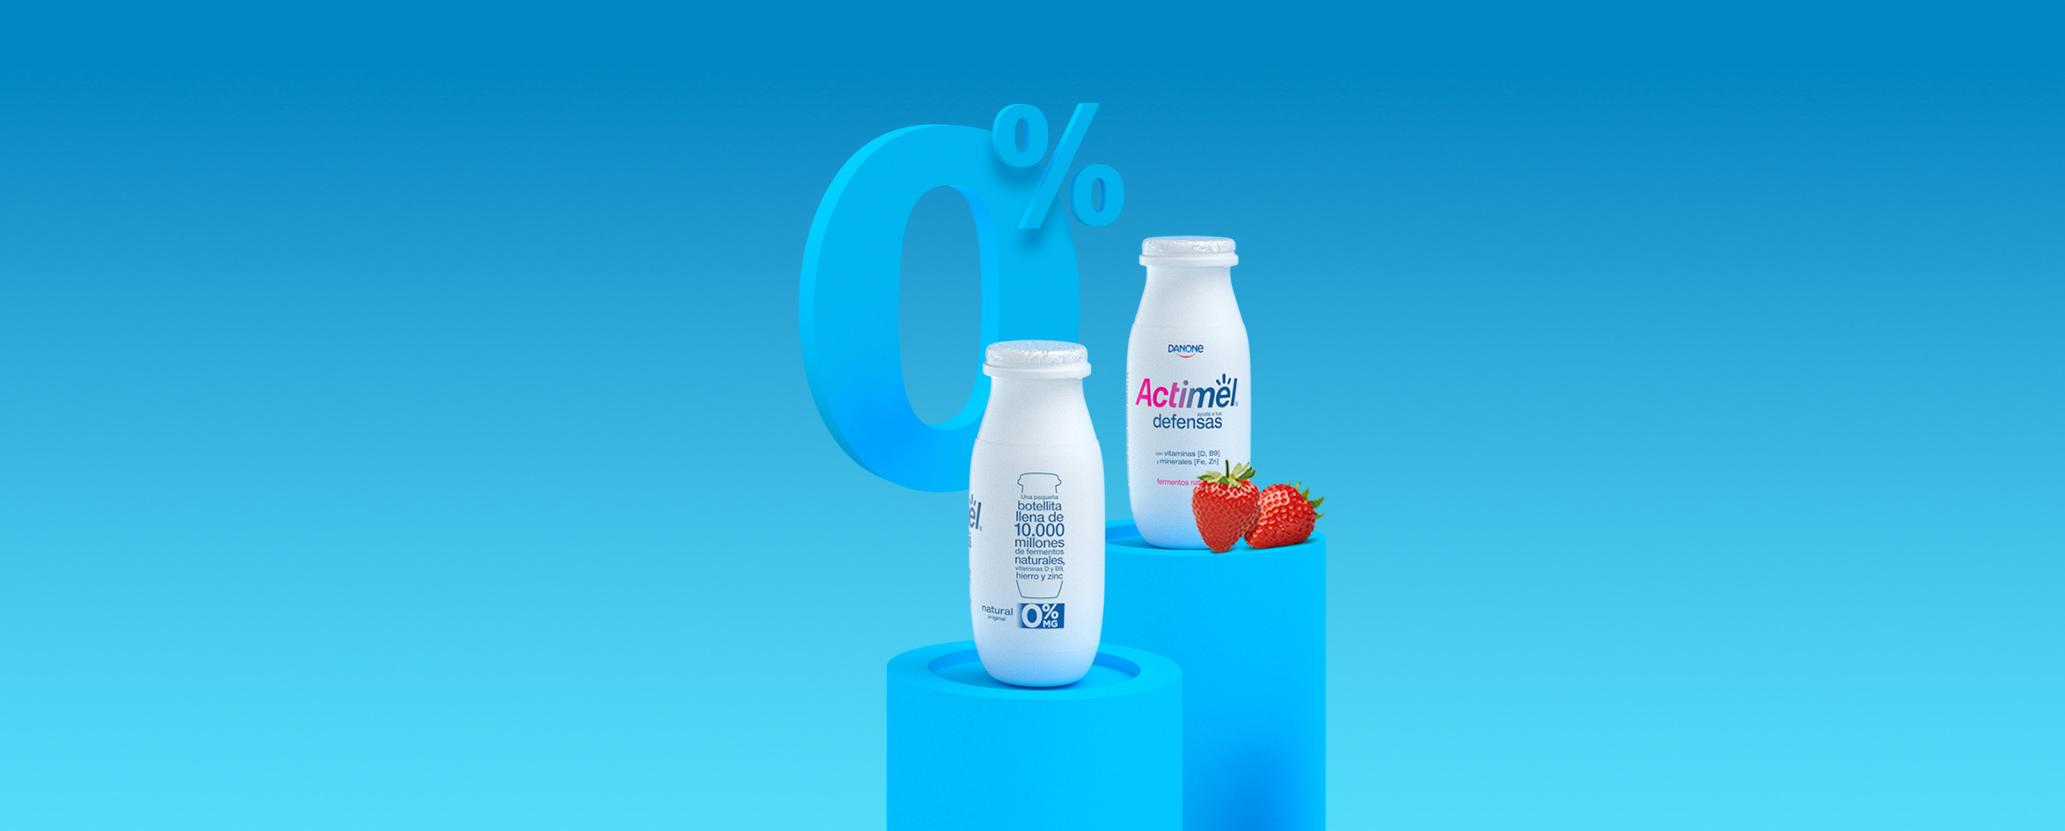 Actimel 0% materia grasa Background